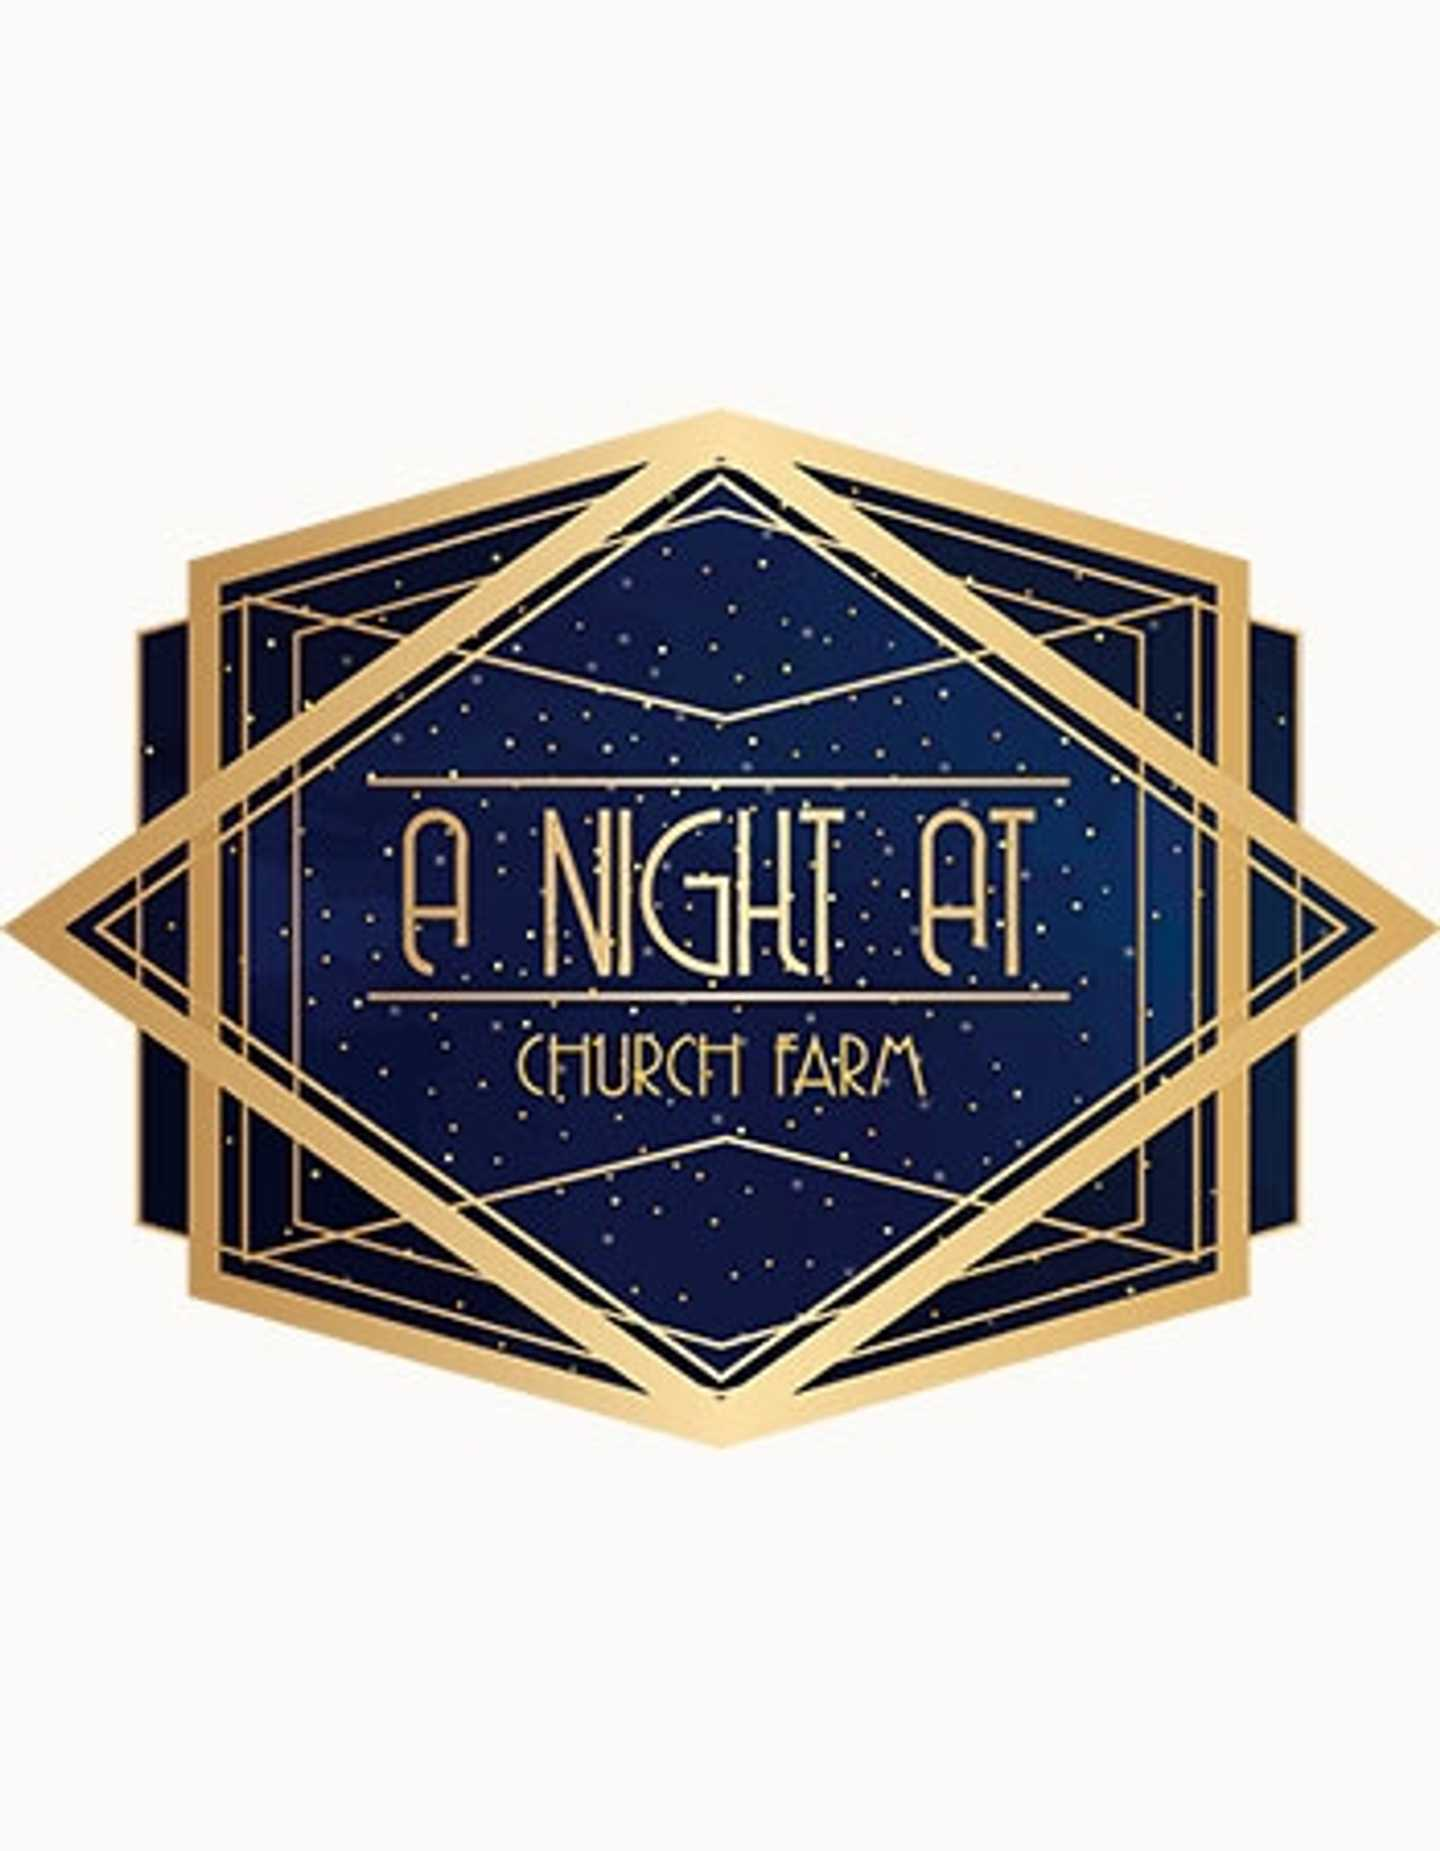 A night @ Church Farm